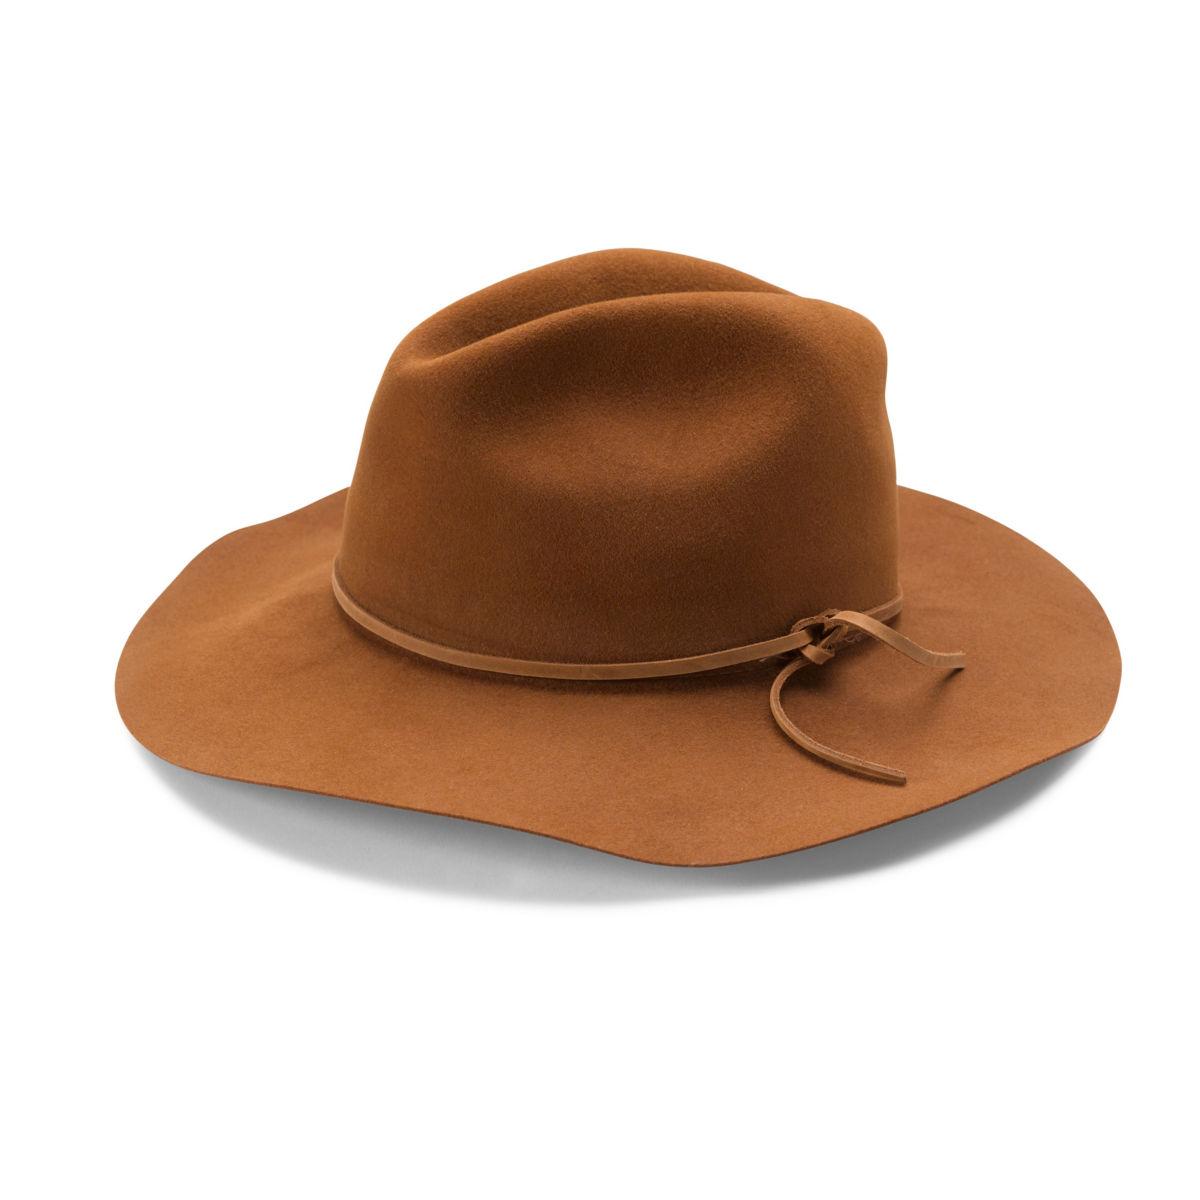 Whiskey Creek Fur Felt Hat - WHISKEYimage number 0